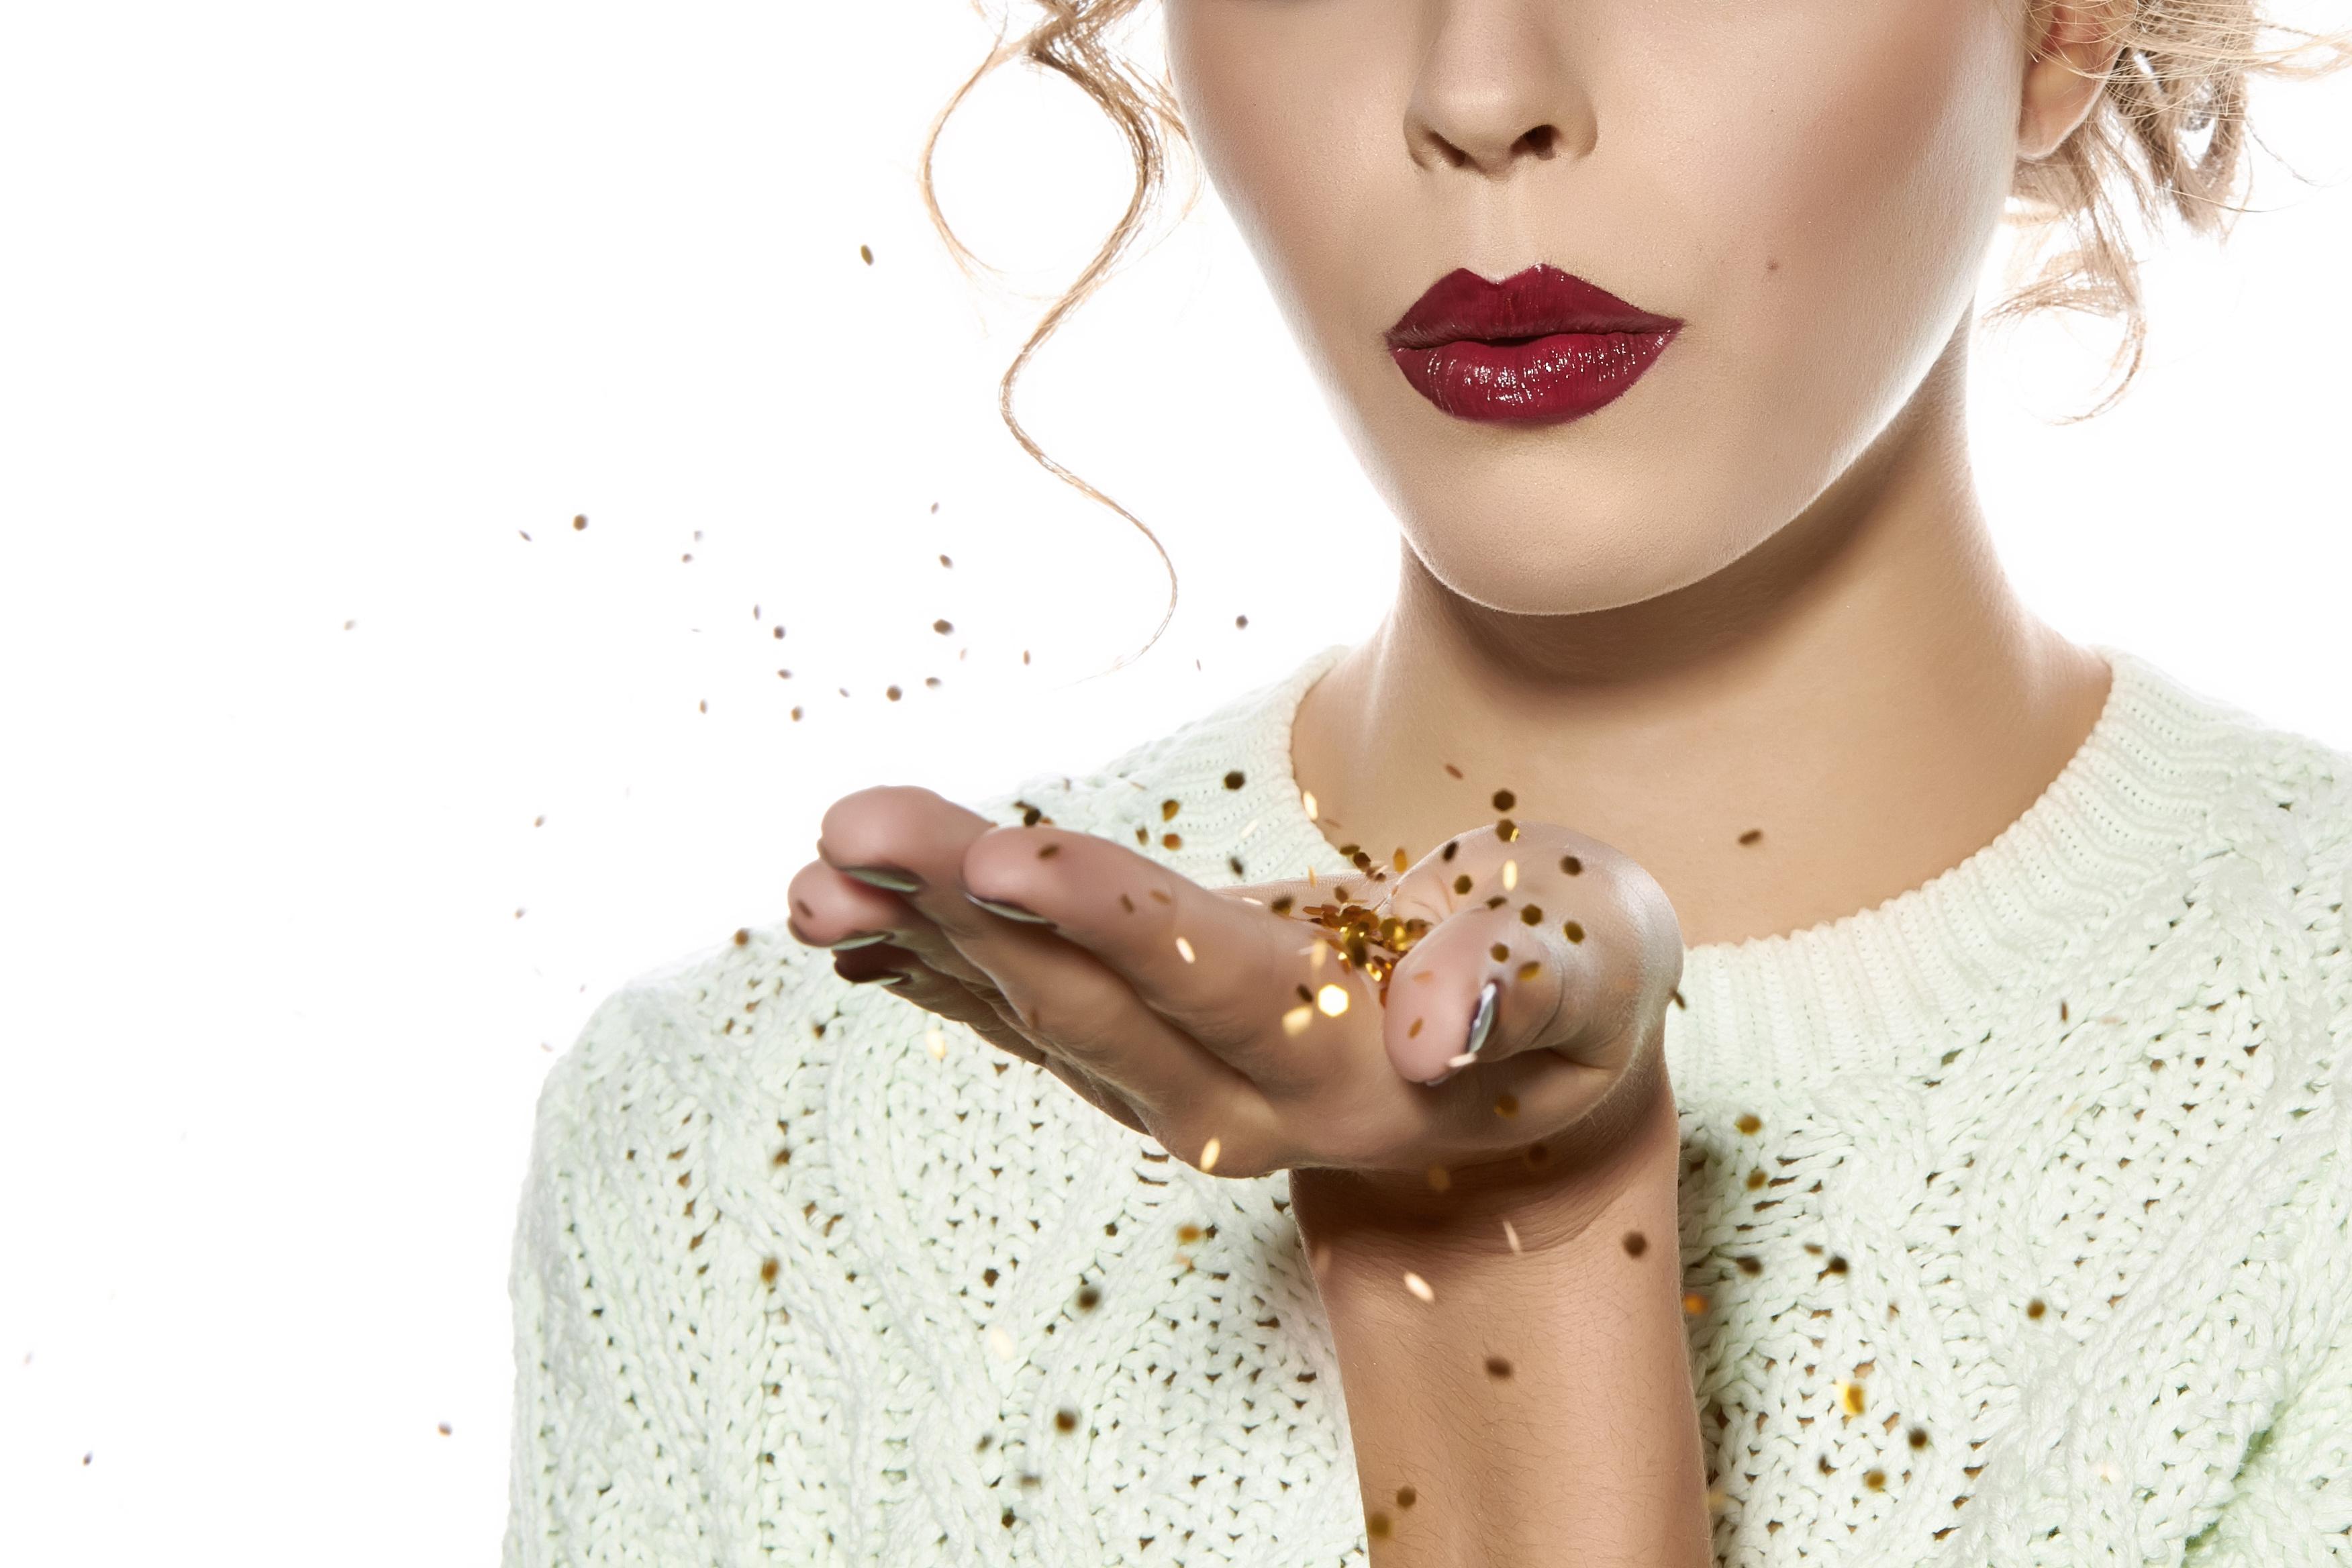 Festive Makeup Looks for the Christmas Season